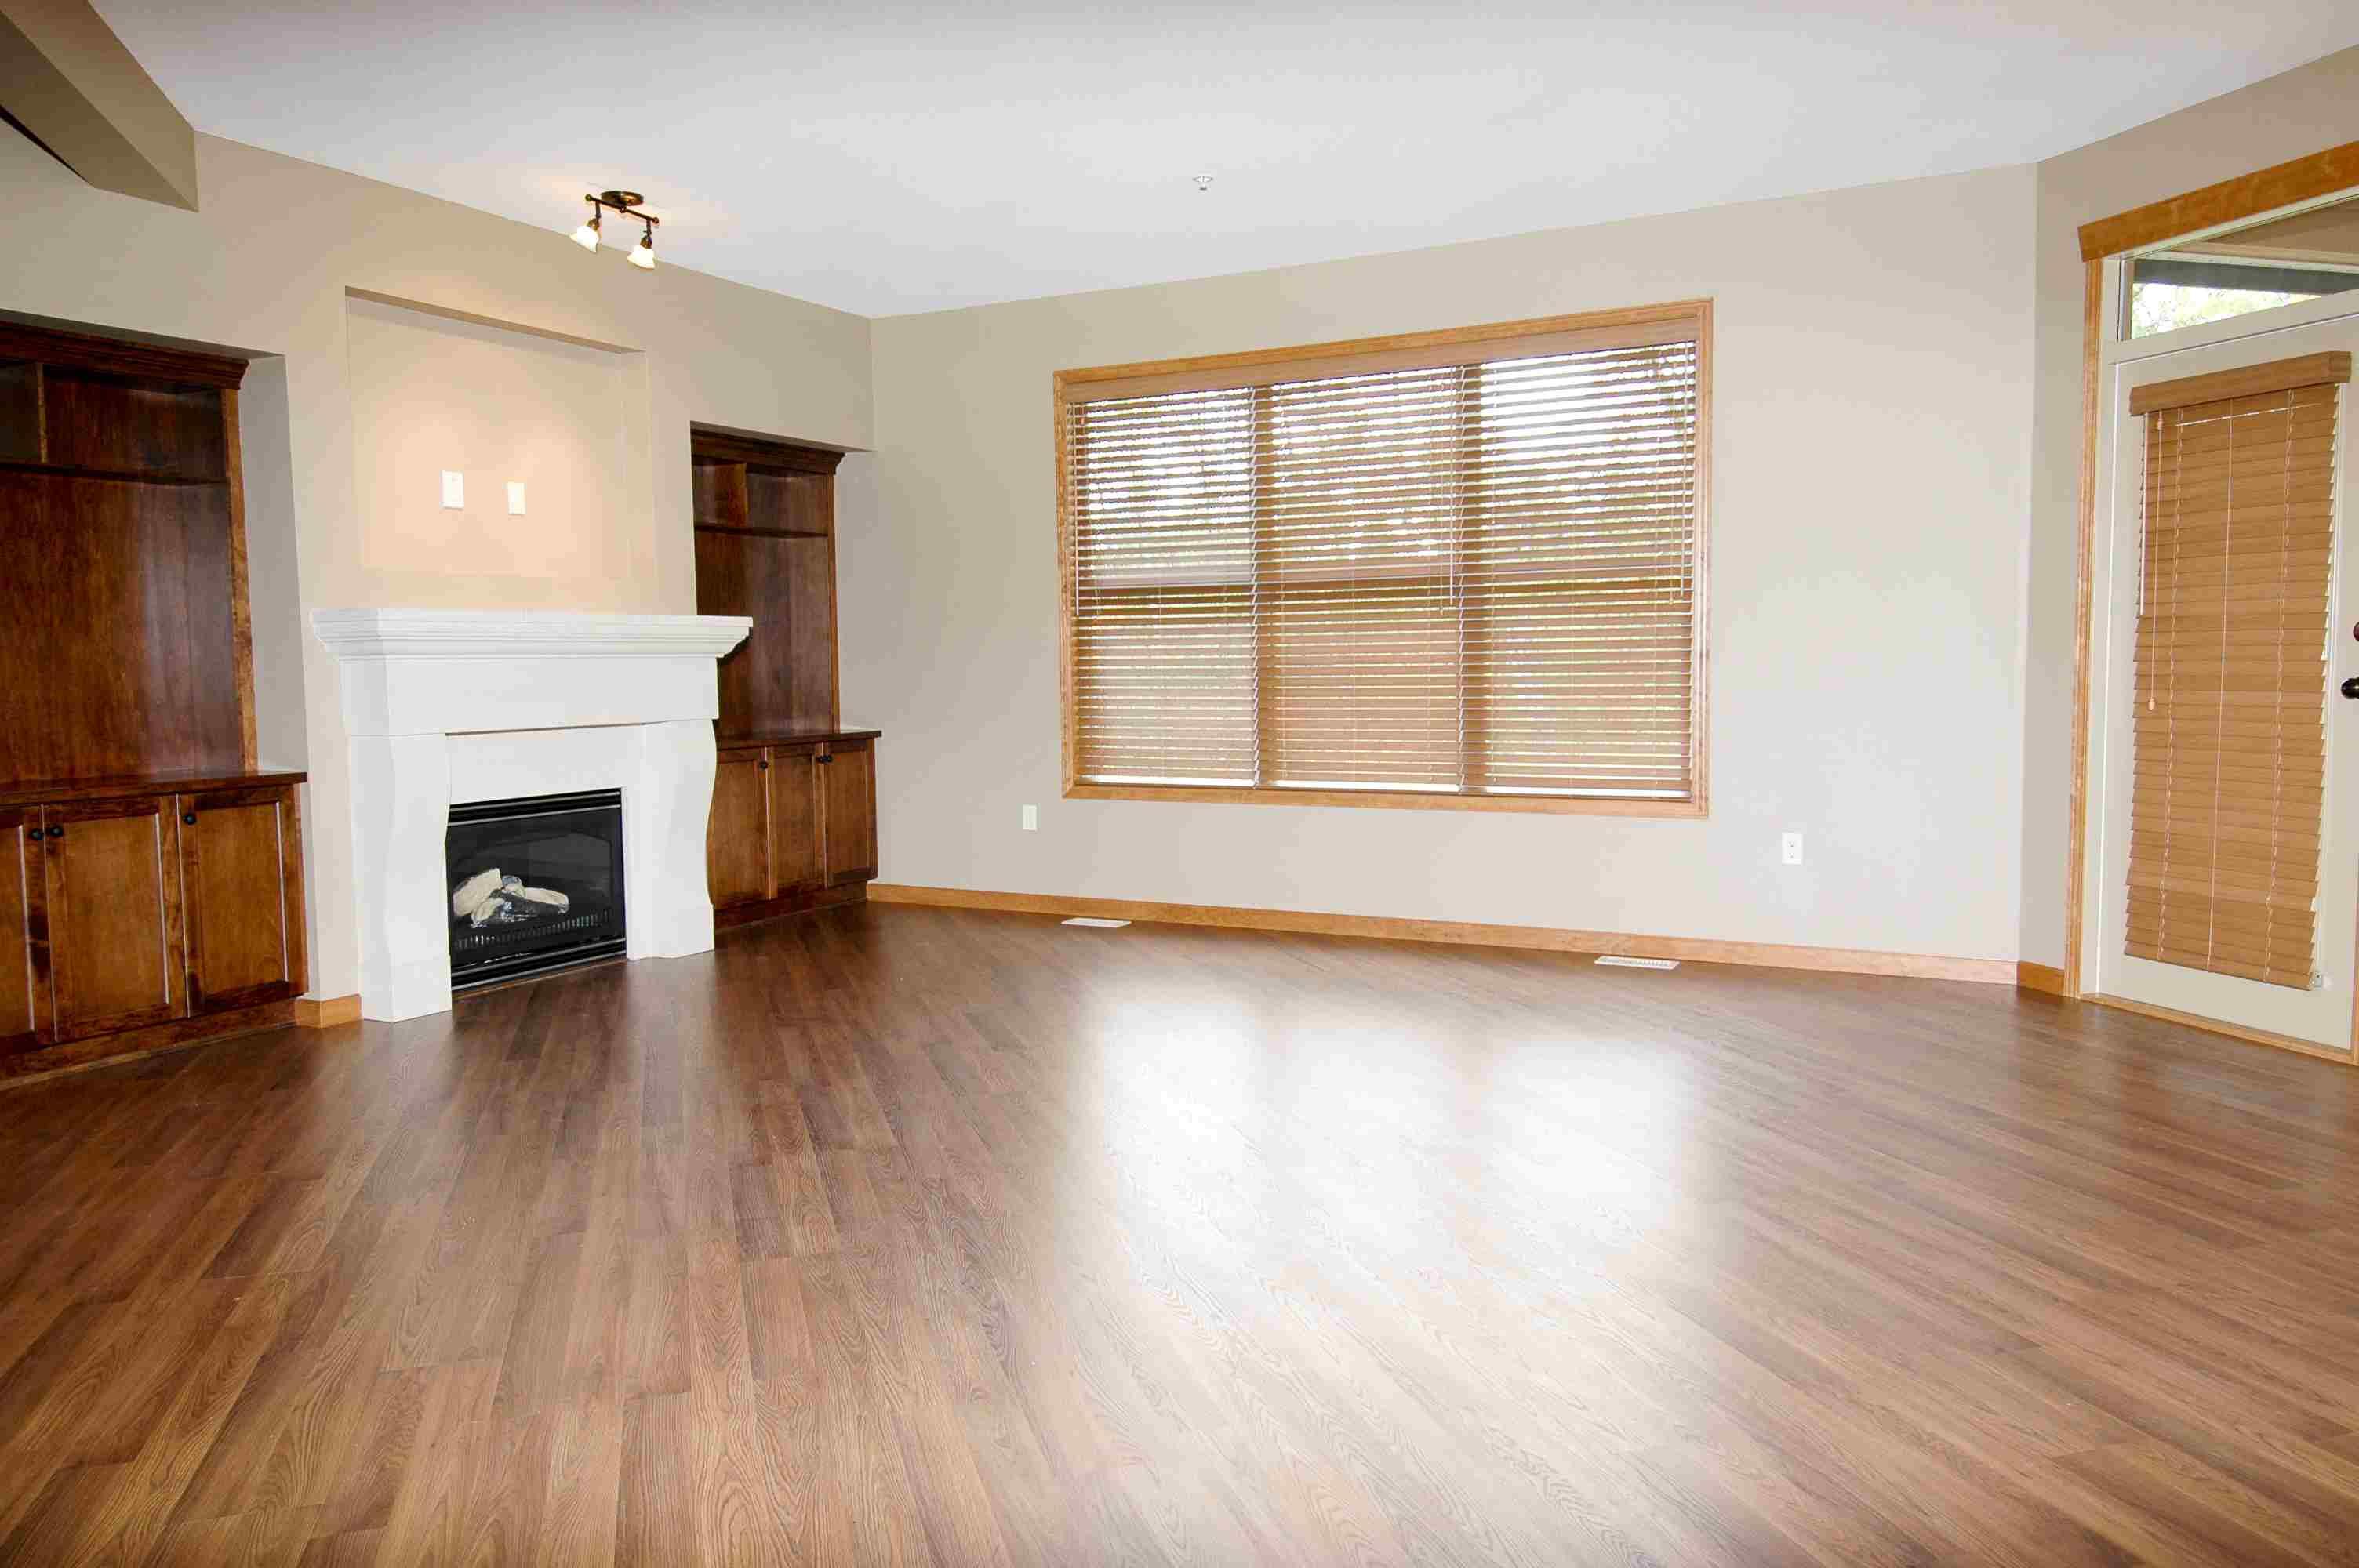 Inspirational Laminate Flooring for Basement Concrete